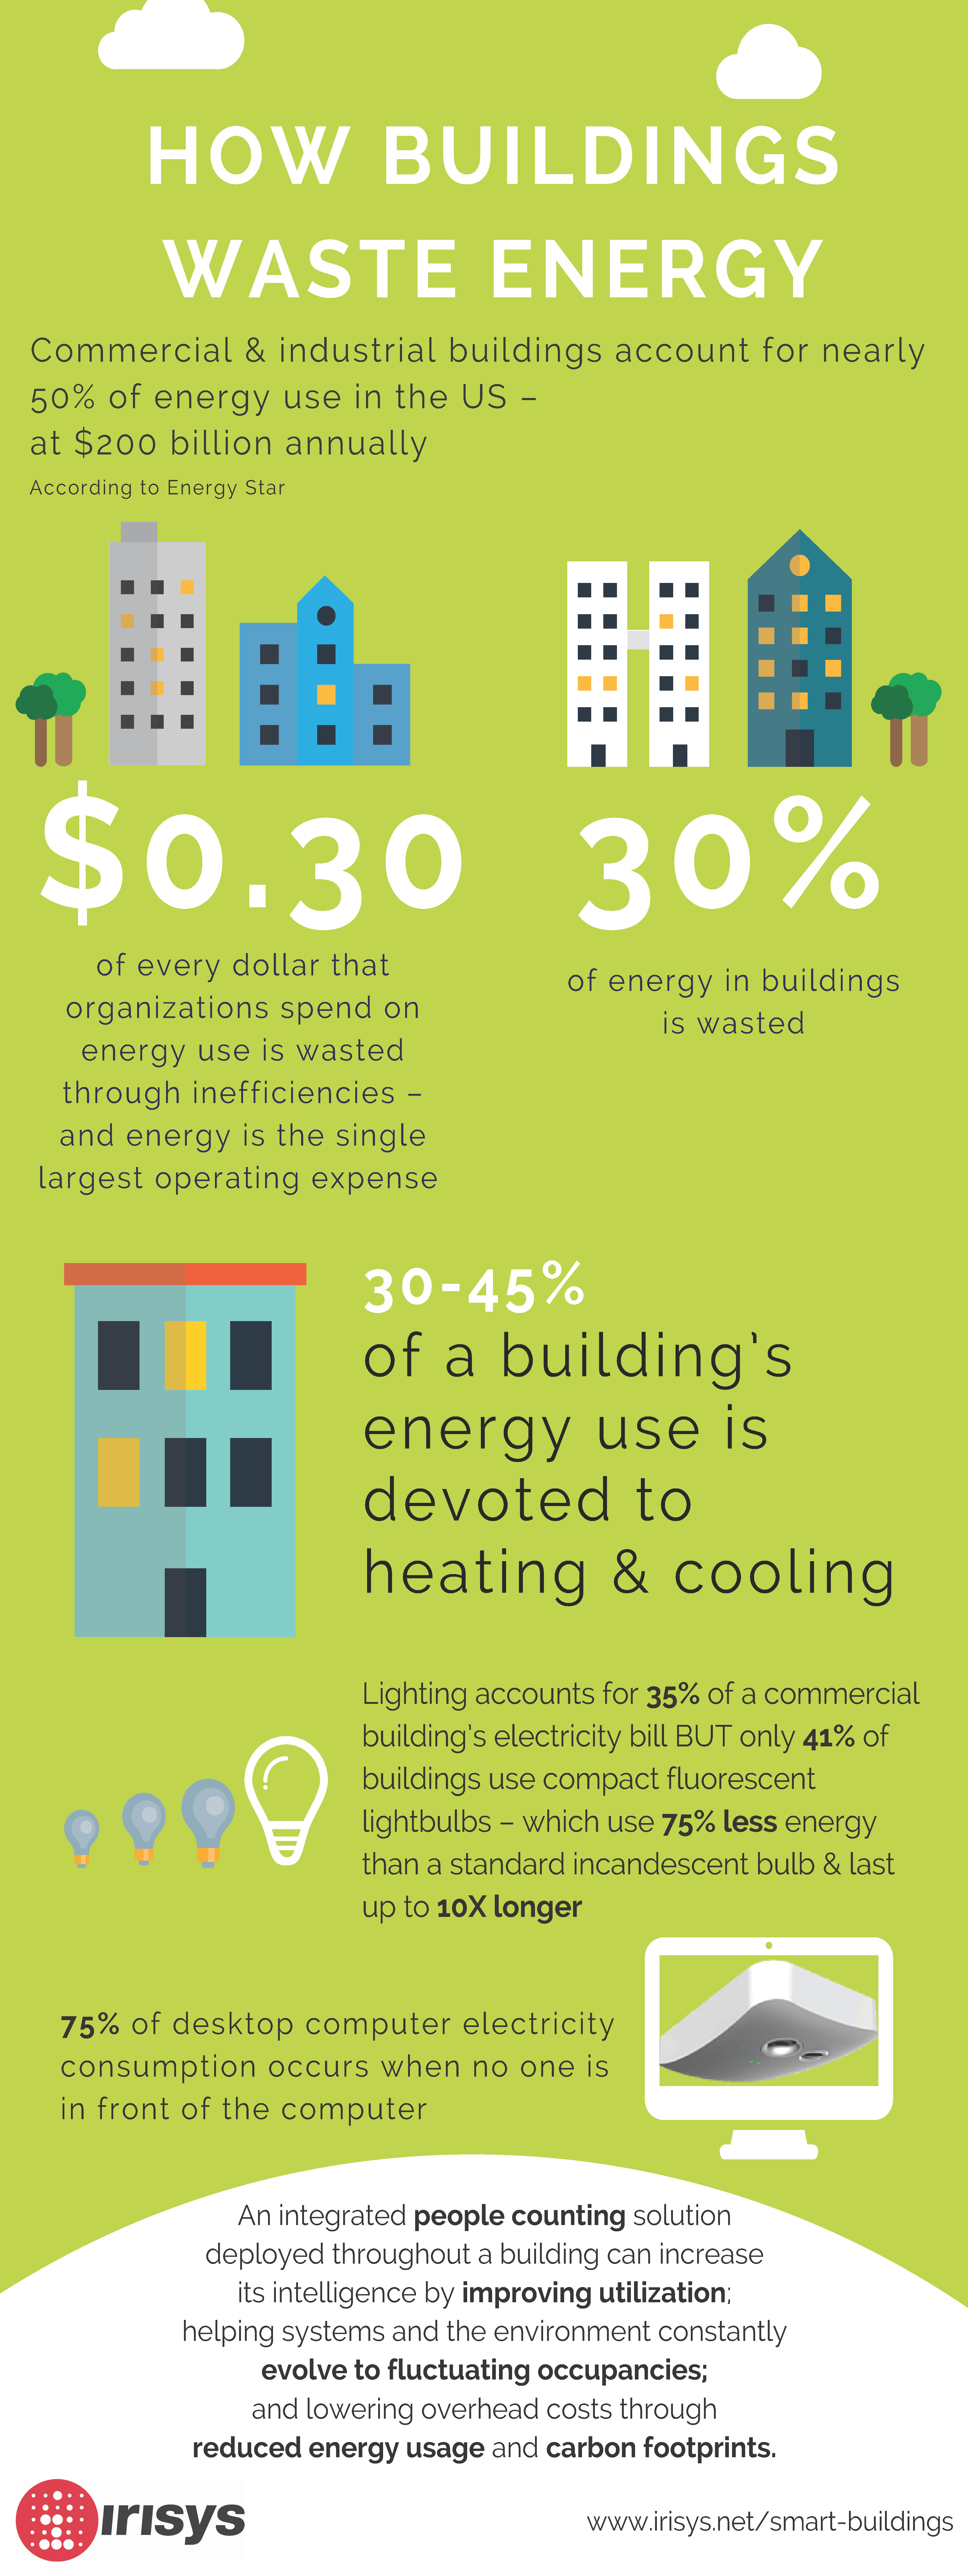 How_Buildings_Waste_Energy_FINAL_2.17.2016.png